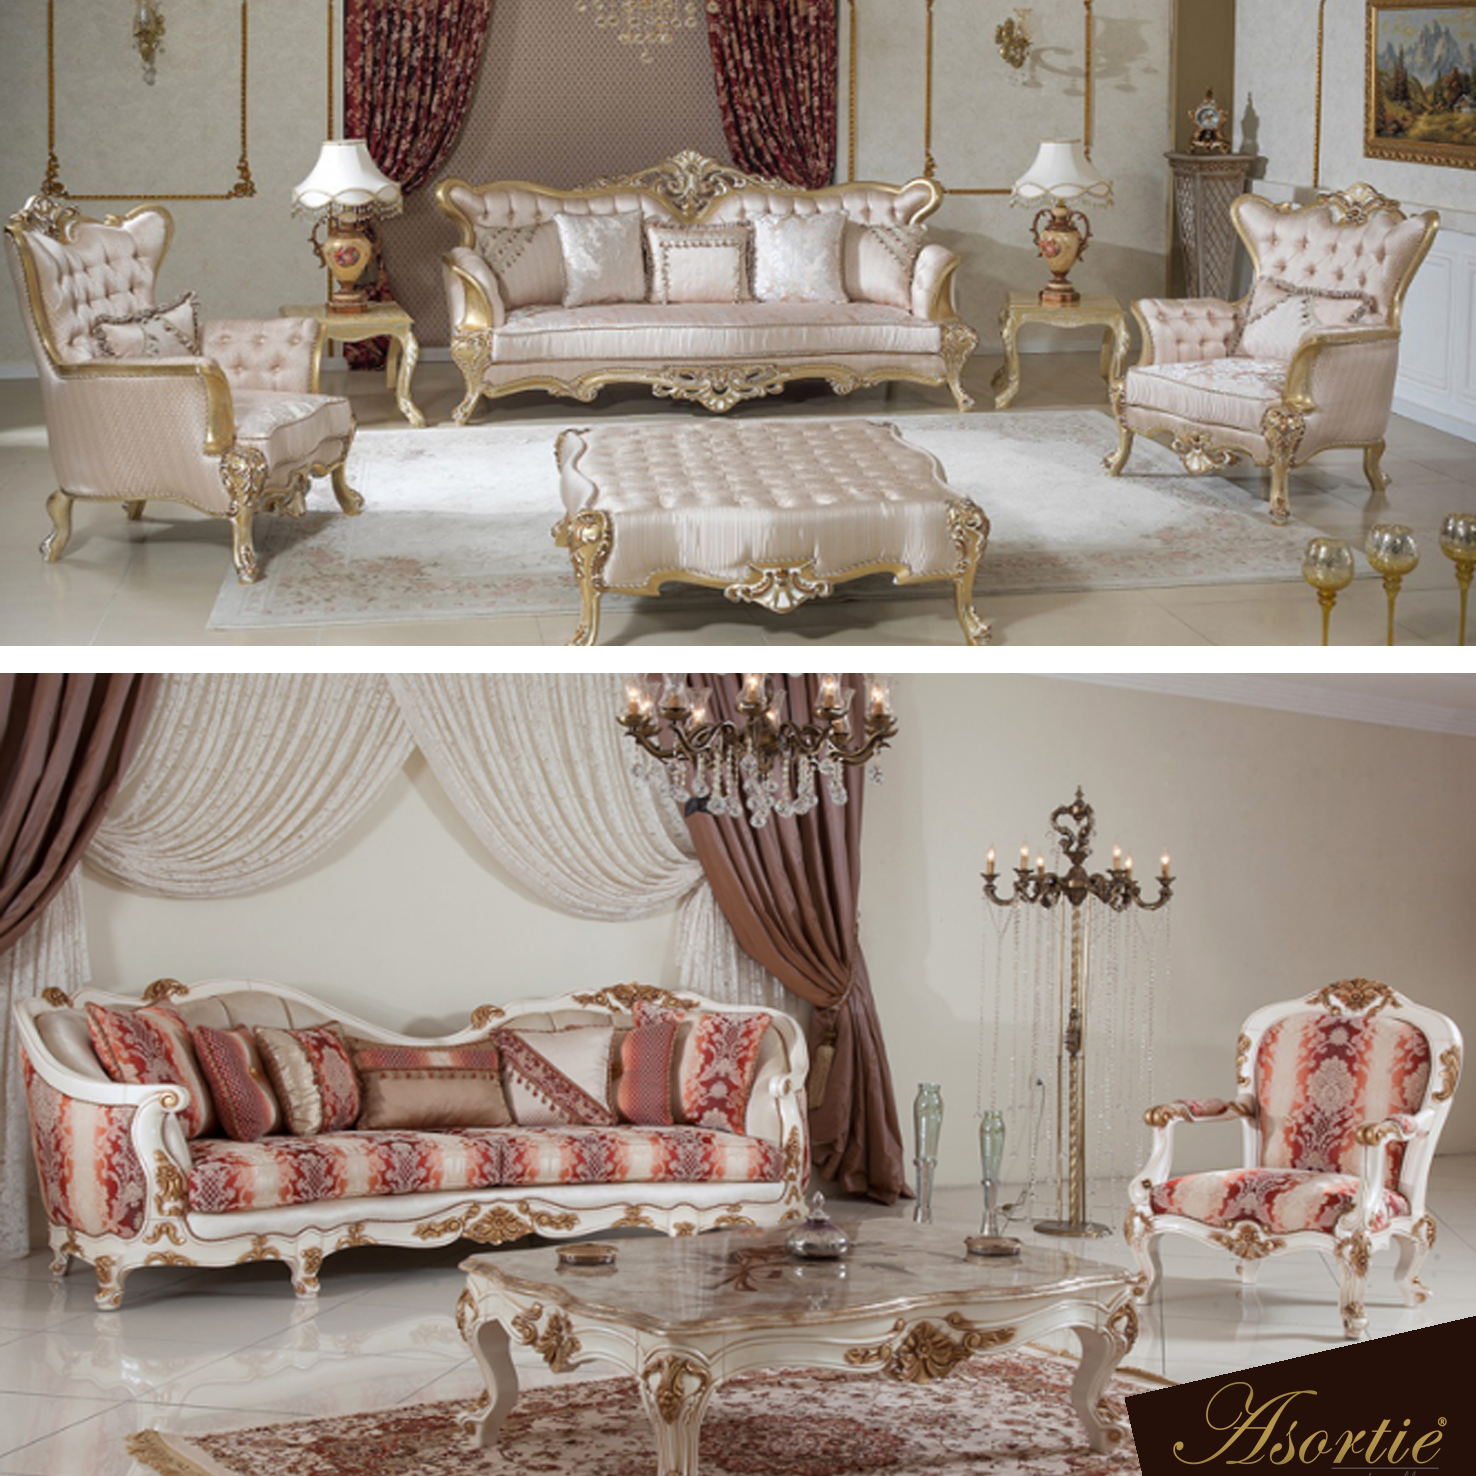 Esella Klasik Koltuk Takimi Esella Classic Sofa Set Luks Evler Mobilya Fikirleri Koltuklar